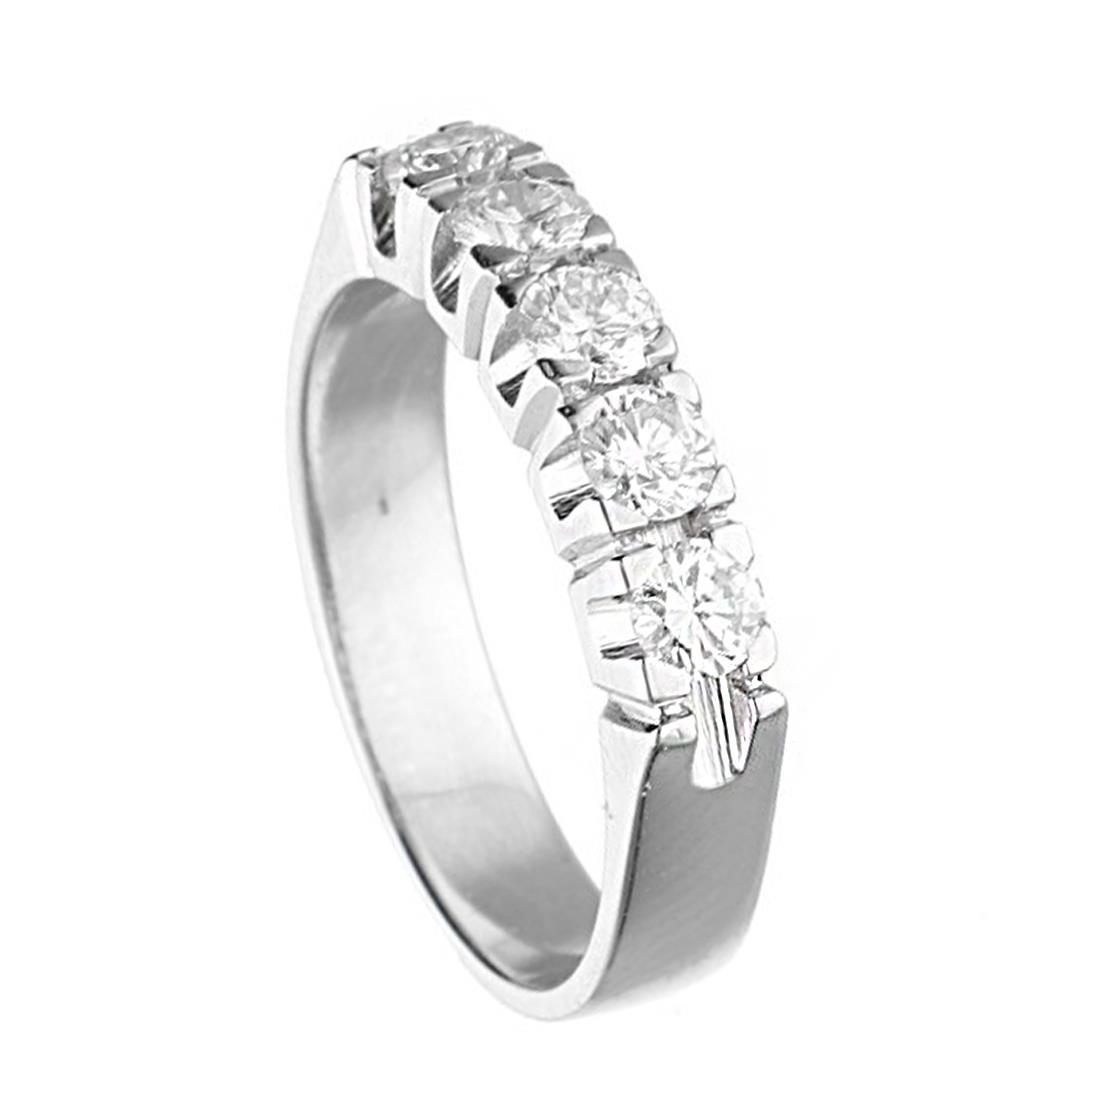 Oro & Co riviére White gold diamond ring size 54 - ORO&CO